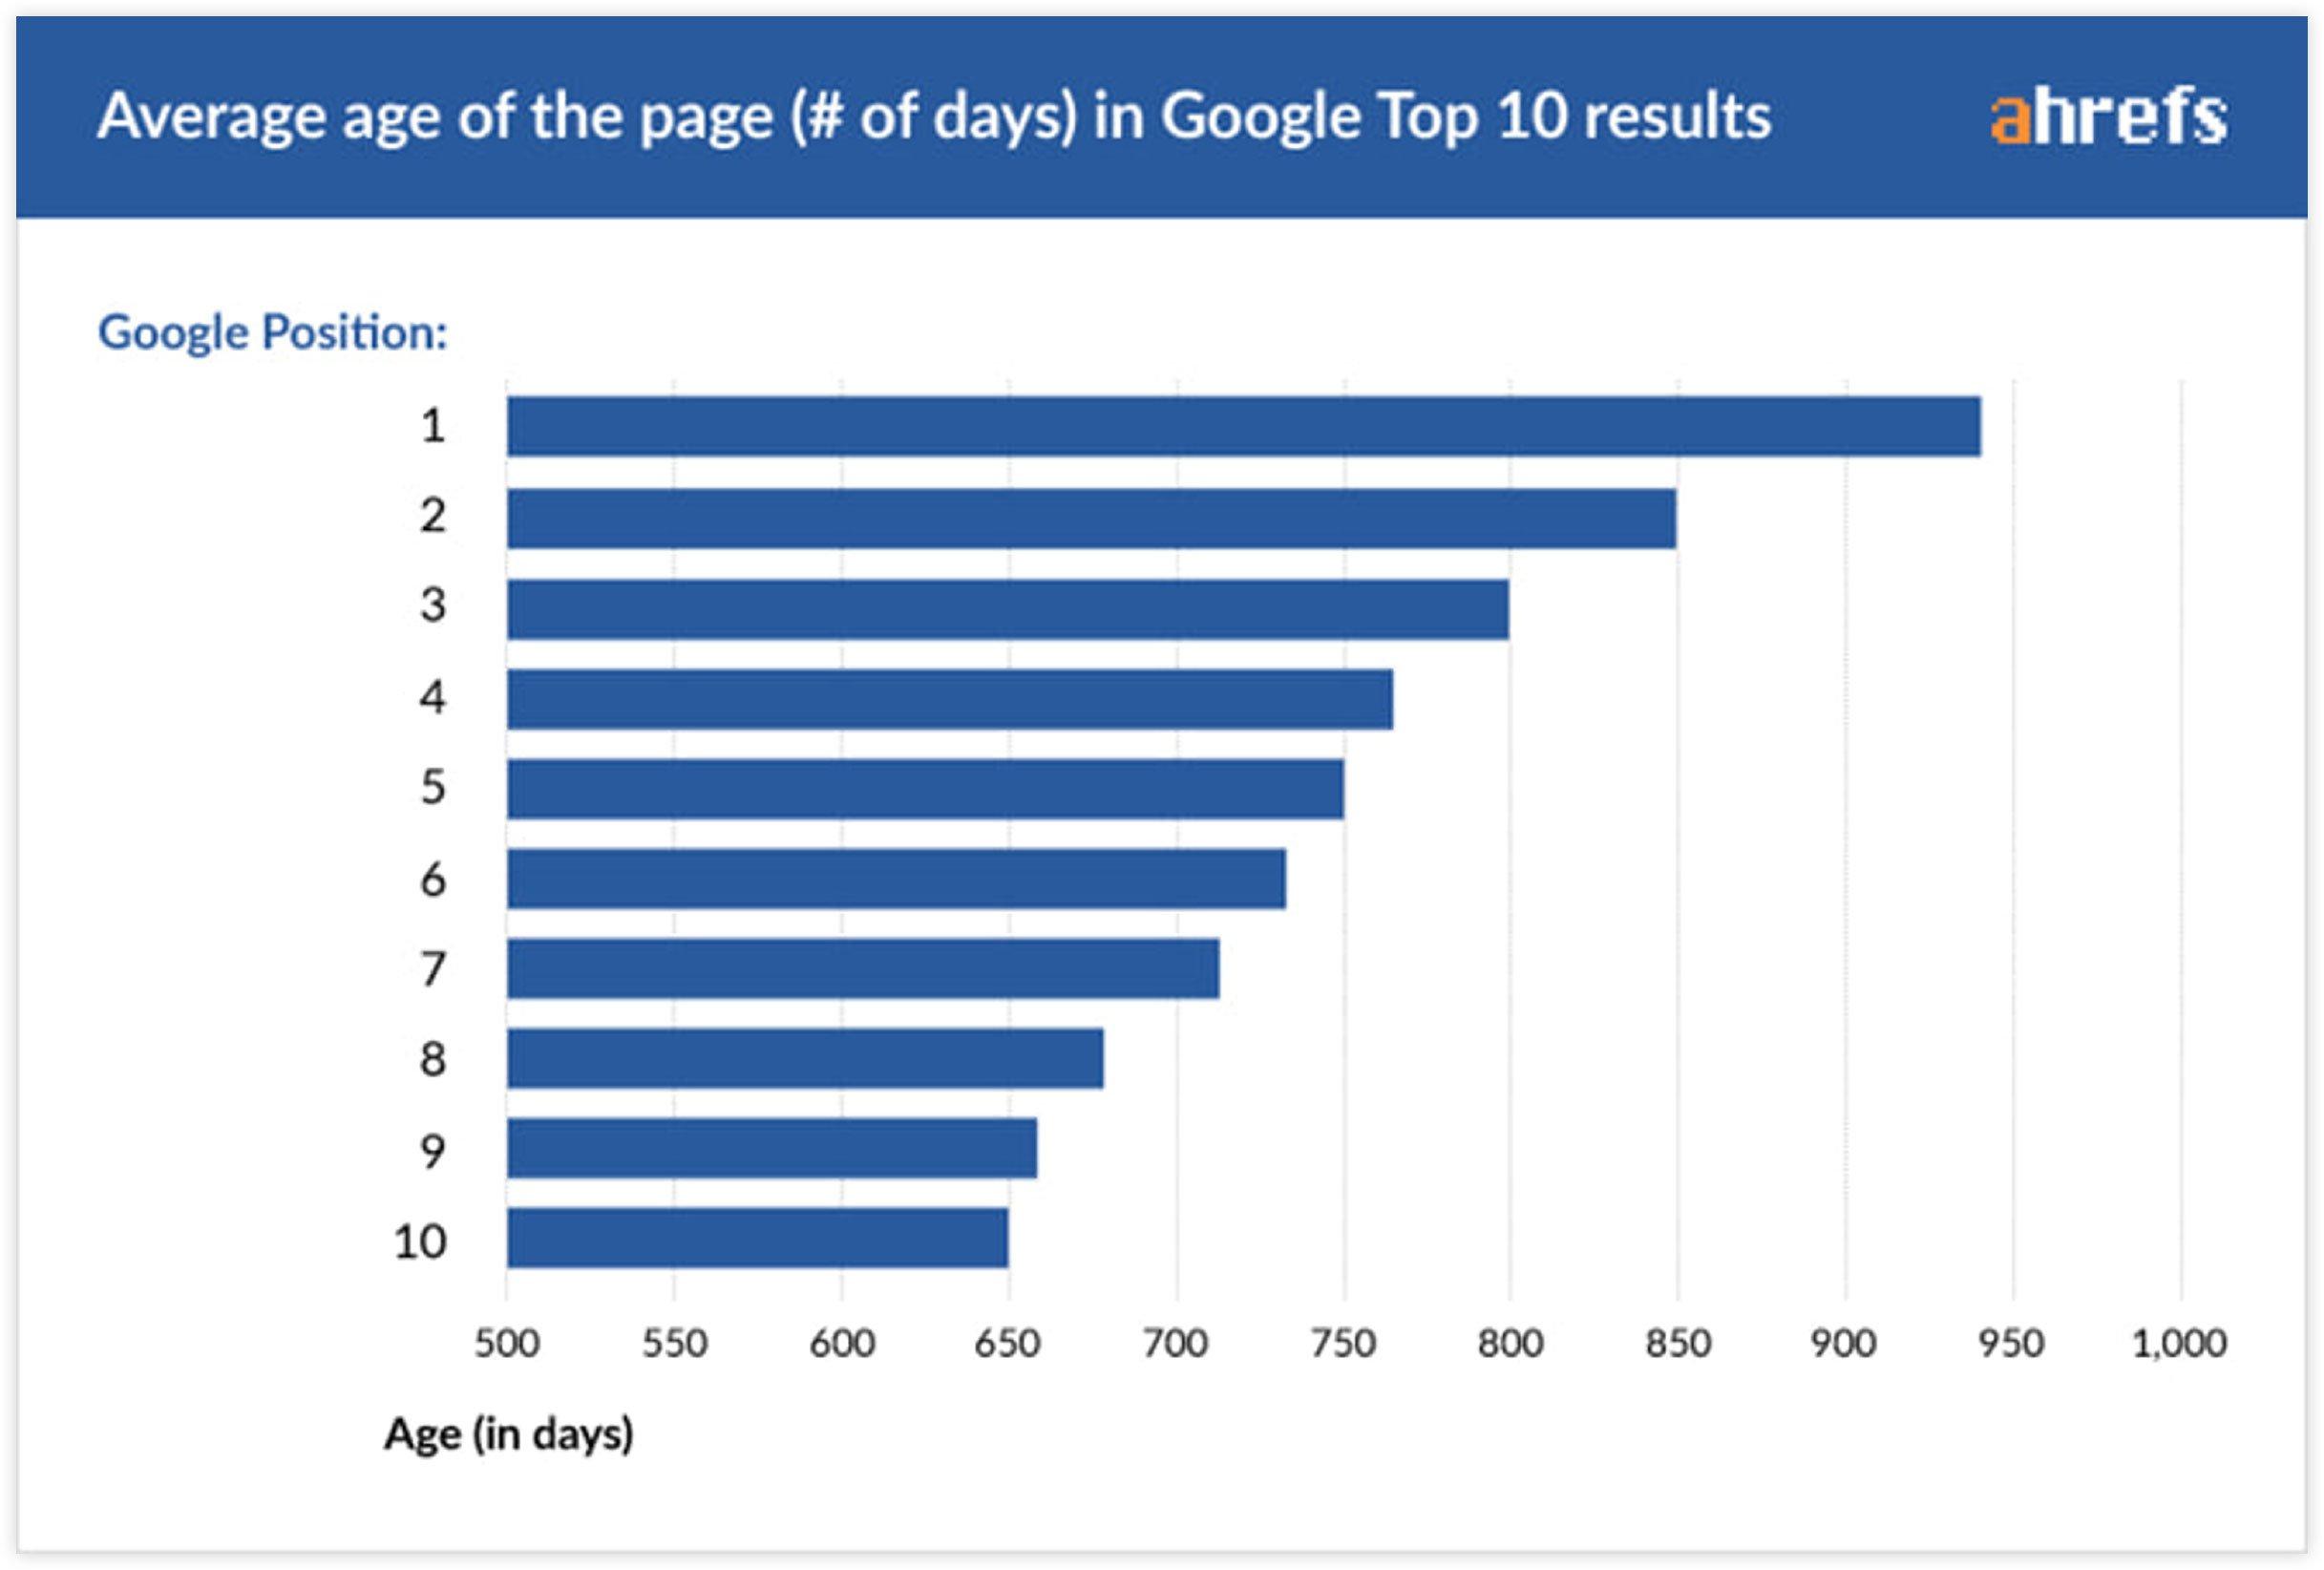 ahref page age statistics